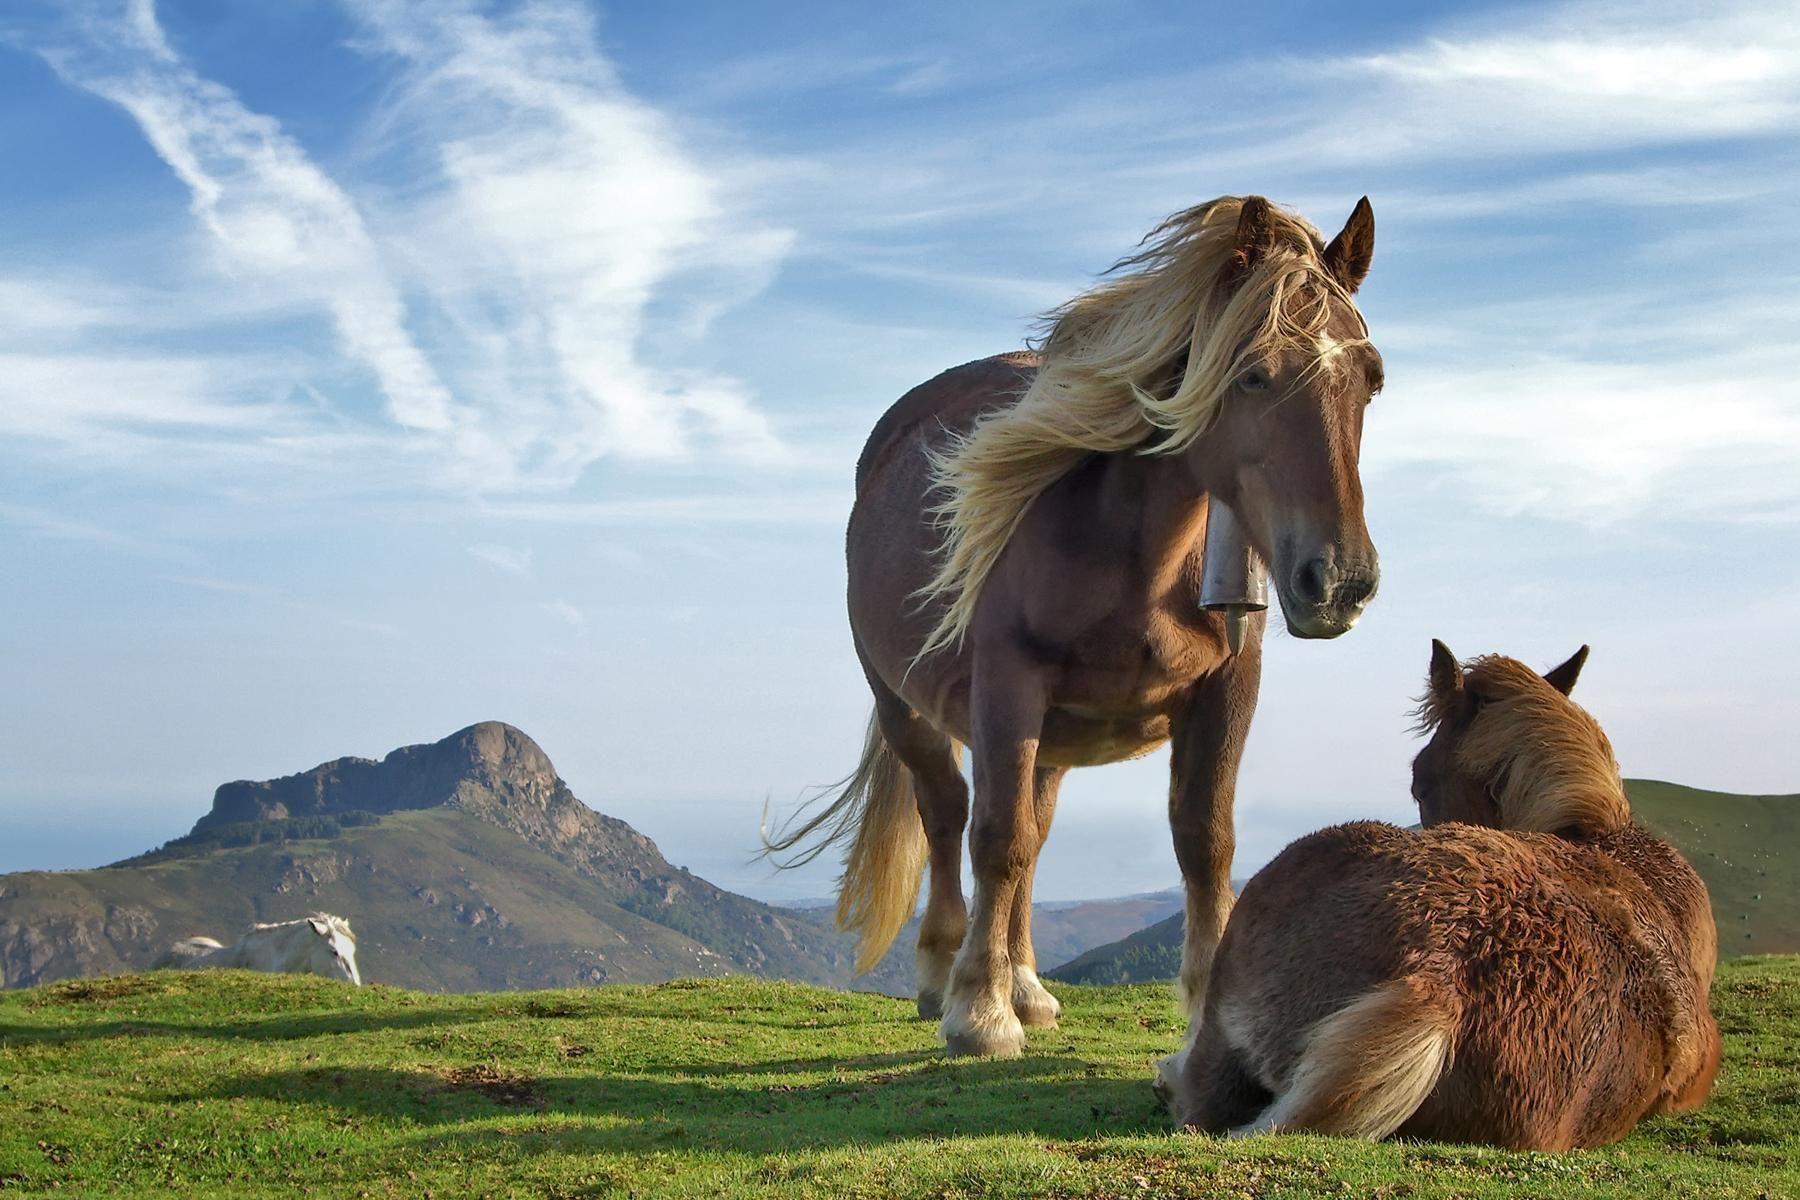 Wild Animals Hi Bebo Orkut Twitter Horses Stallions 283055 Wallpaper